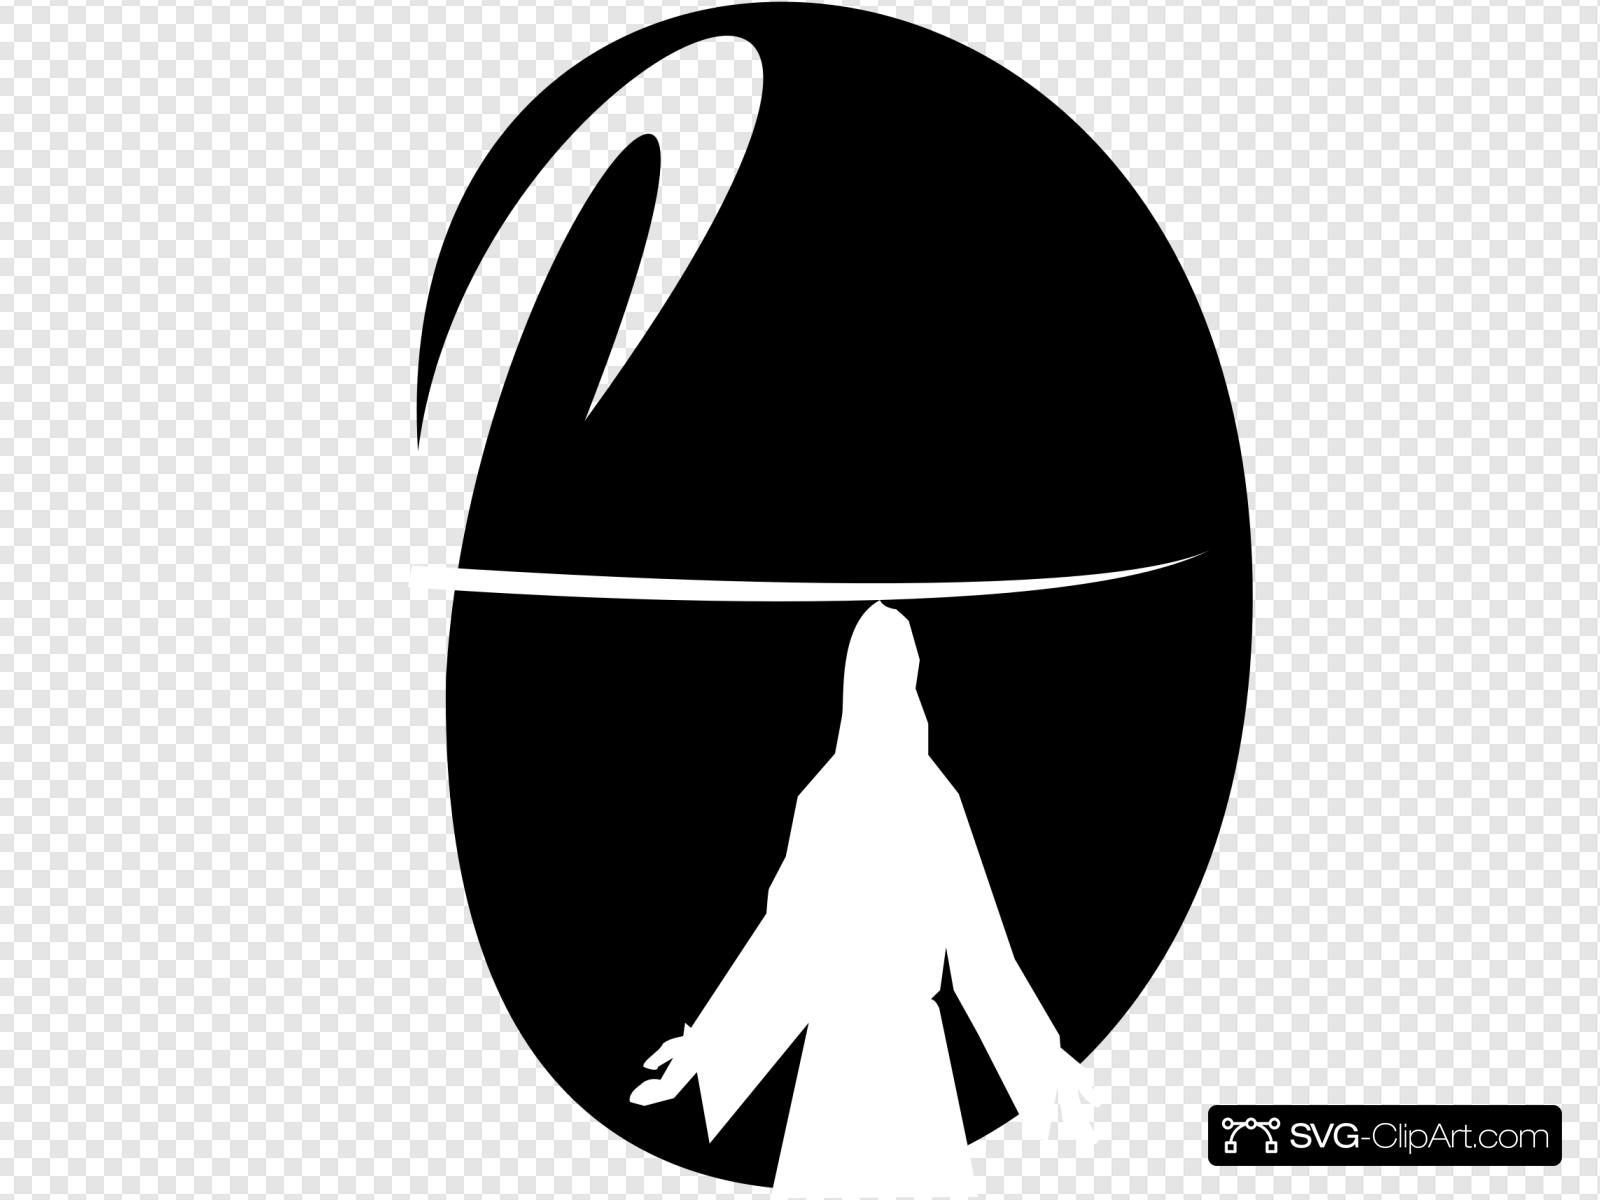 Faith Arise Black Clip art, Icon and SVG.